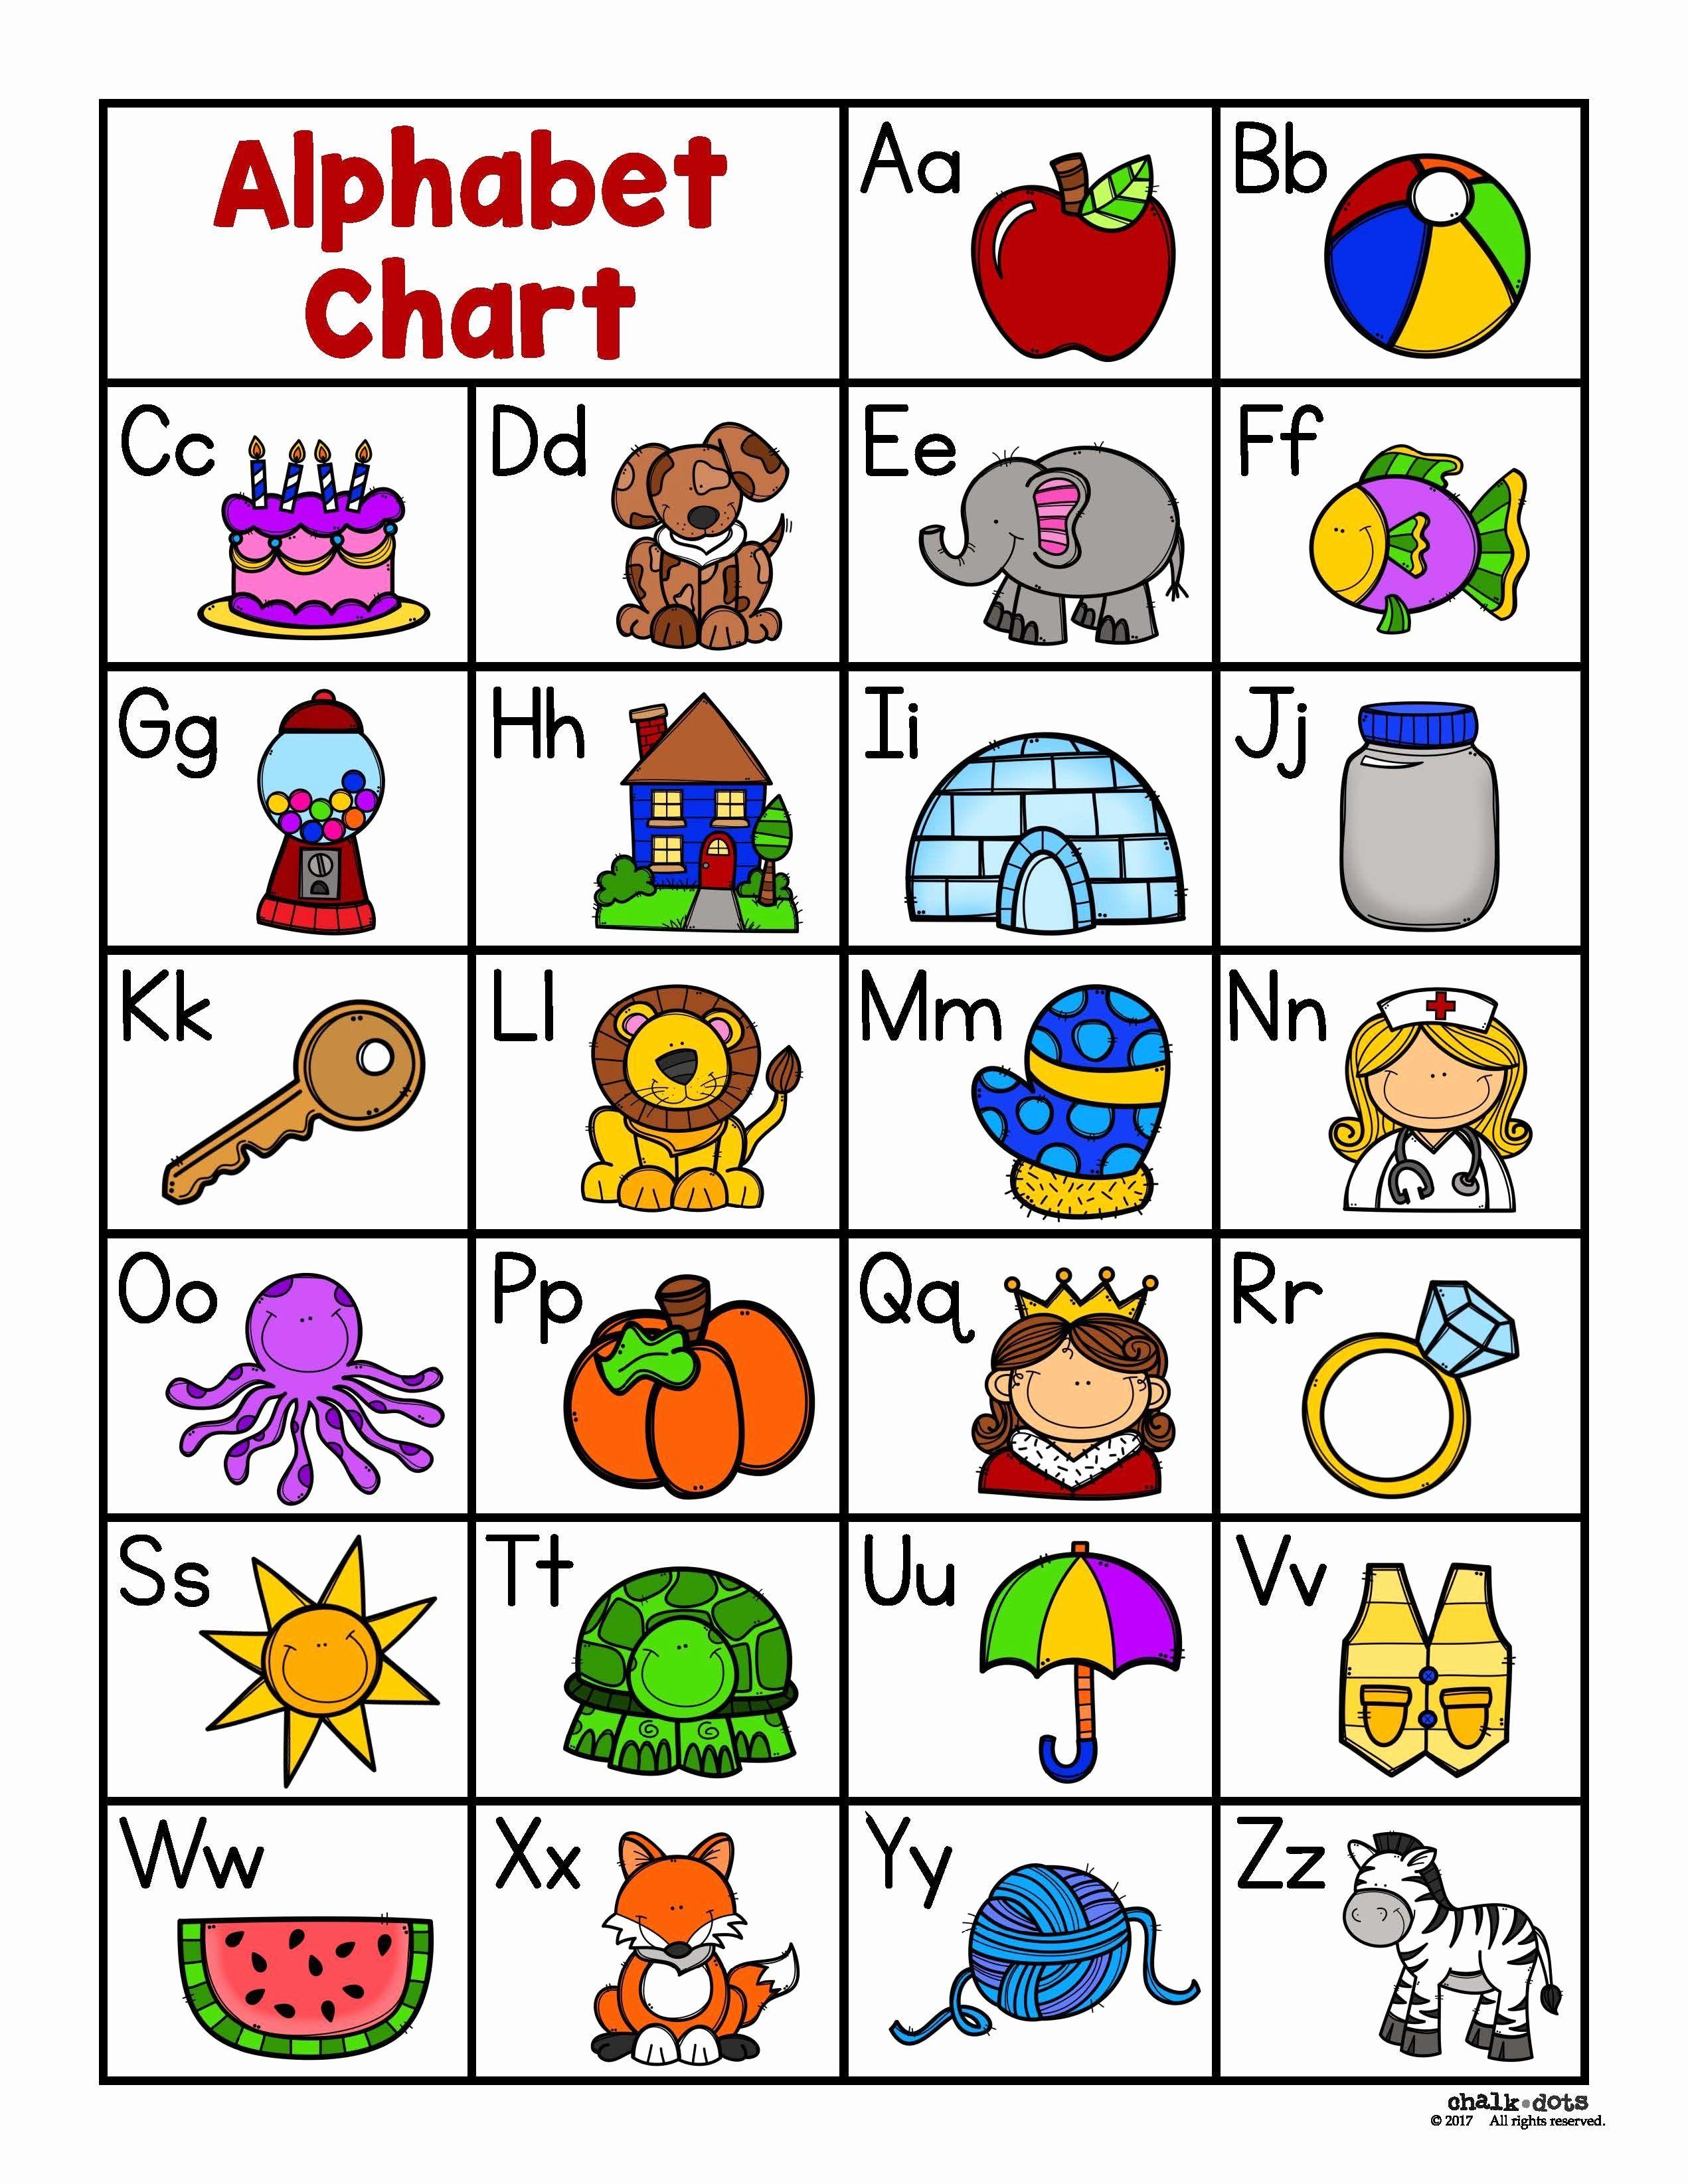 Alphabet Coloring Chart Printable Unique Alphabet Chart Teaching Ideas Prek K Alphabet Preschool Alphabet Charts Alphabet Kindergarten